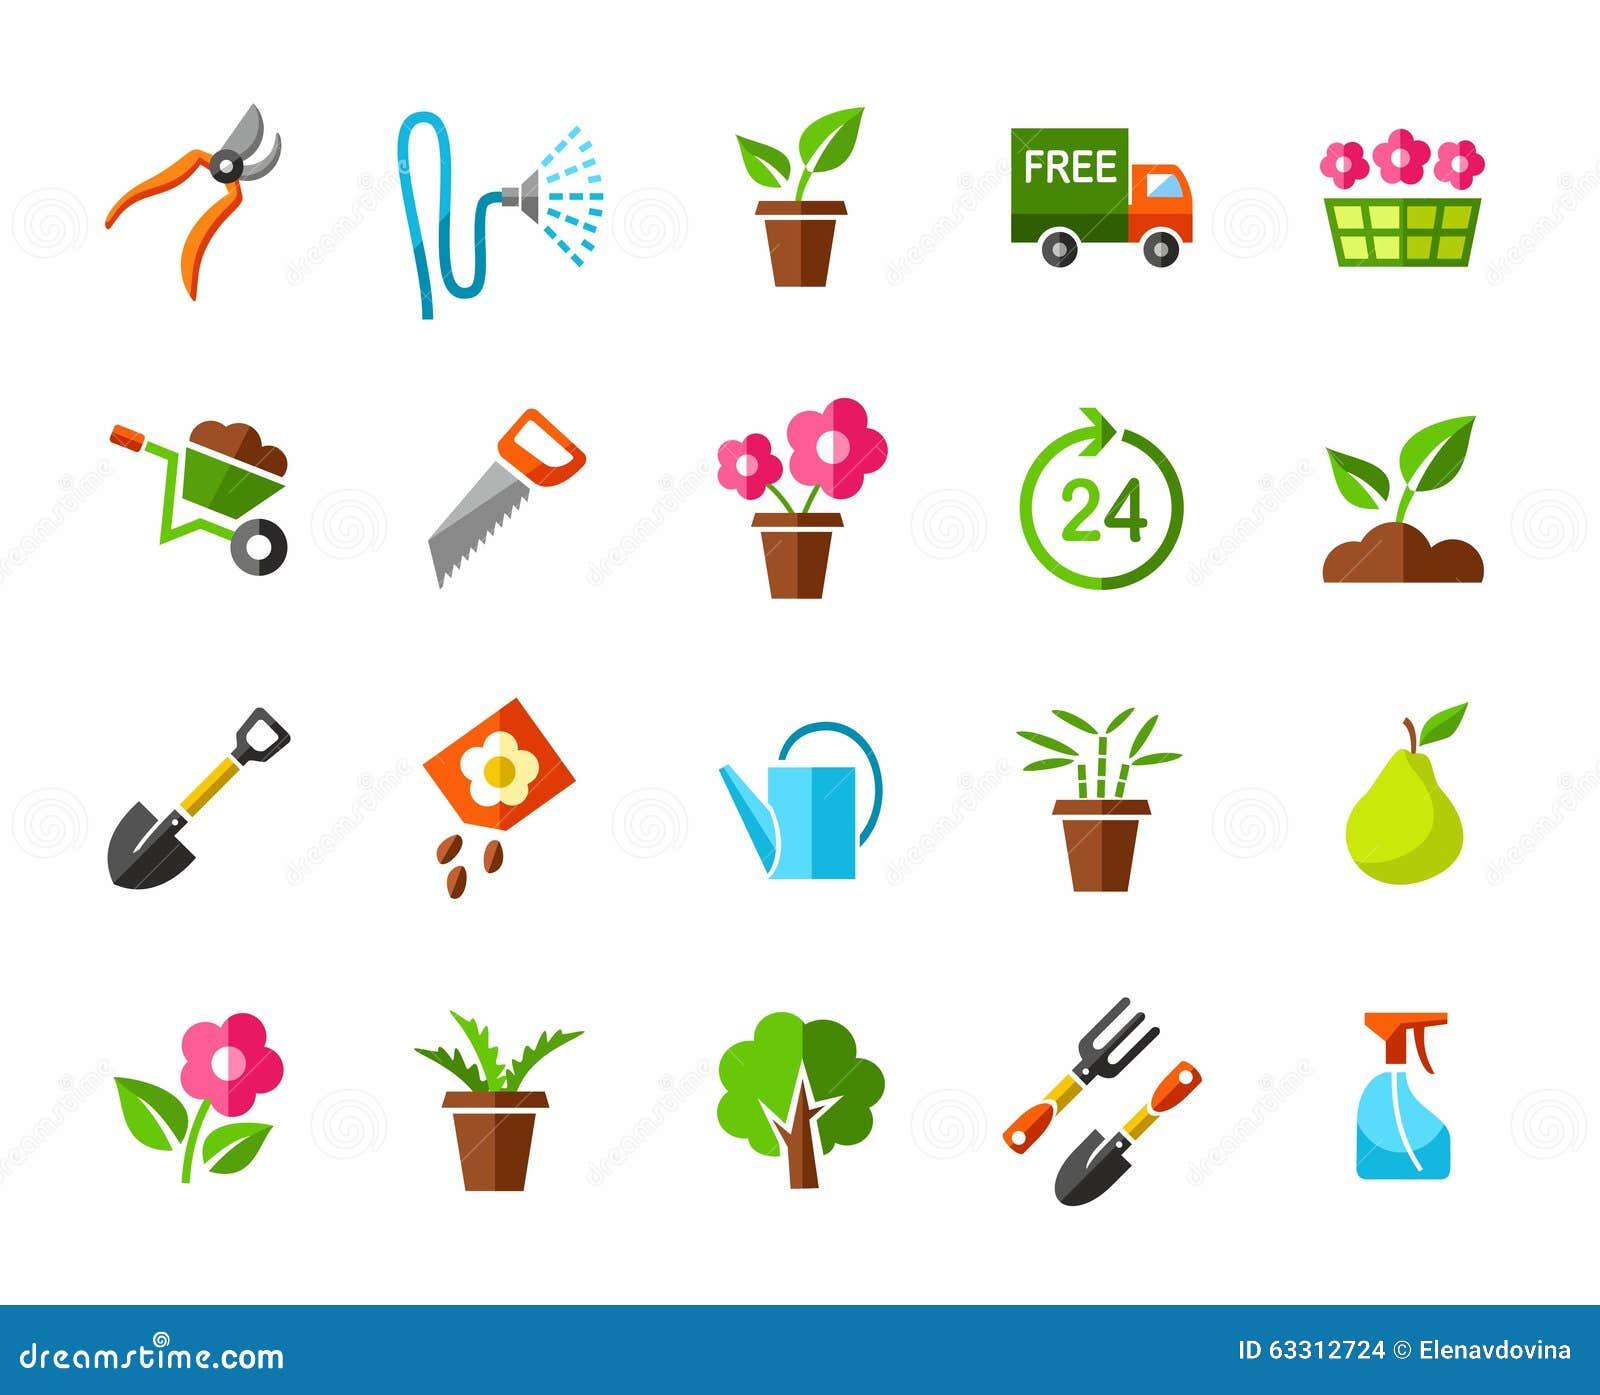 Garden vegetable garden icons colored stock vector for Gardening tools vector